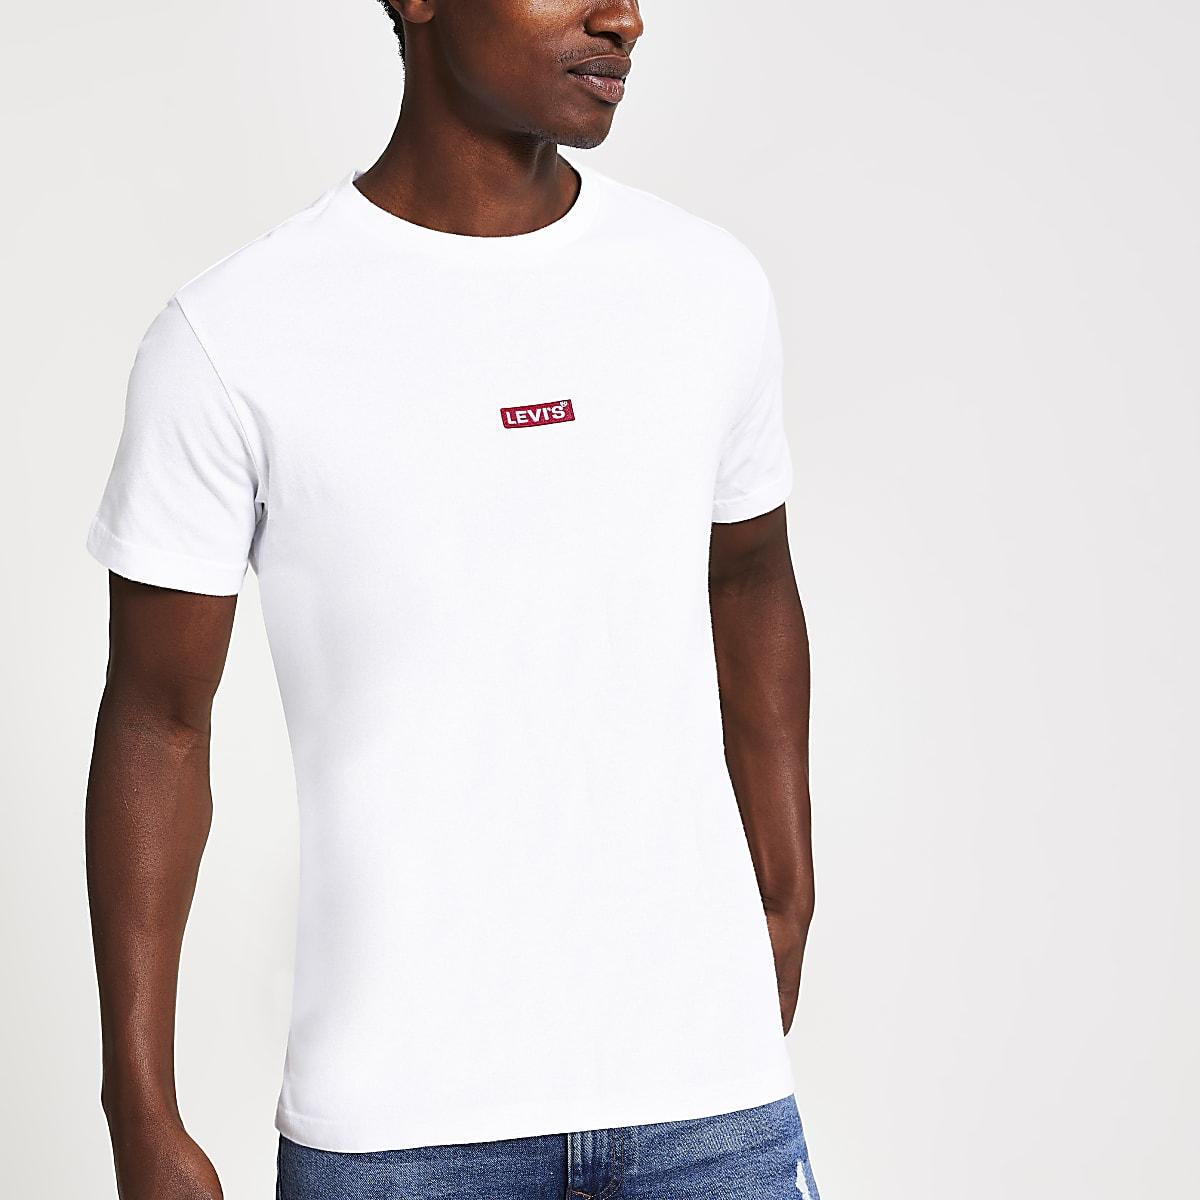 Levi's white logo T-shirt